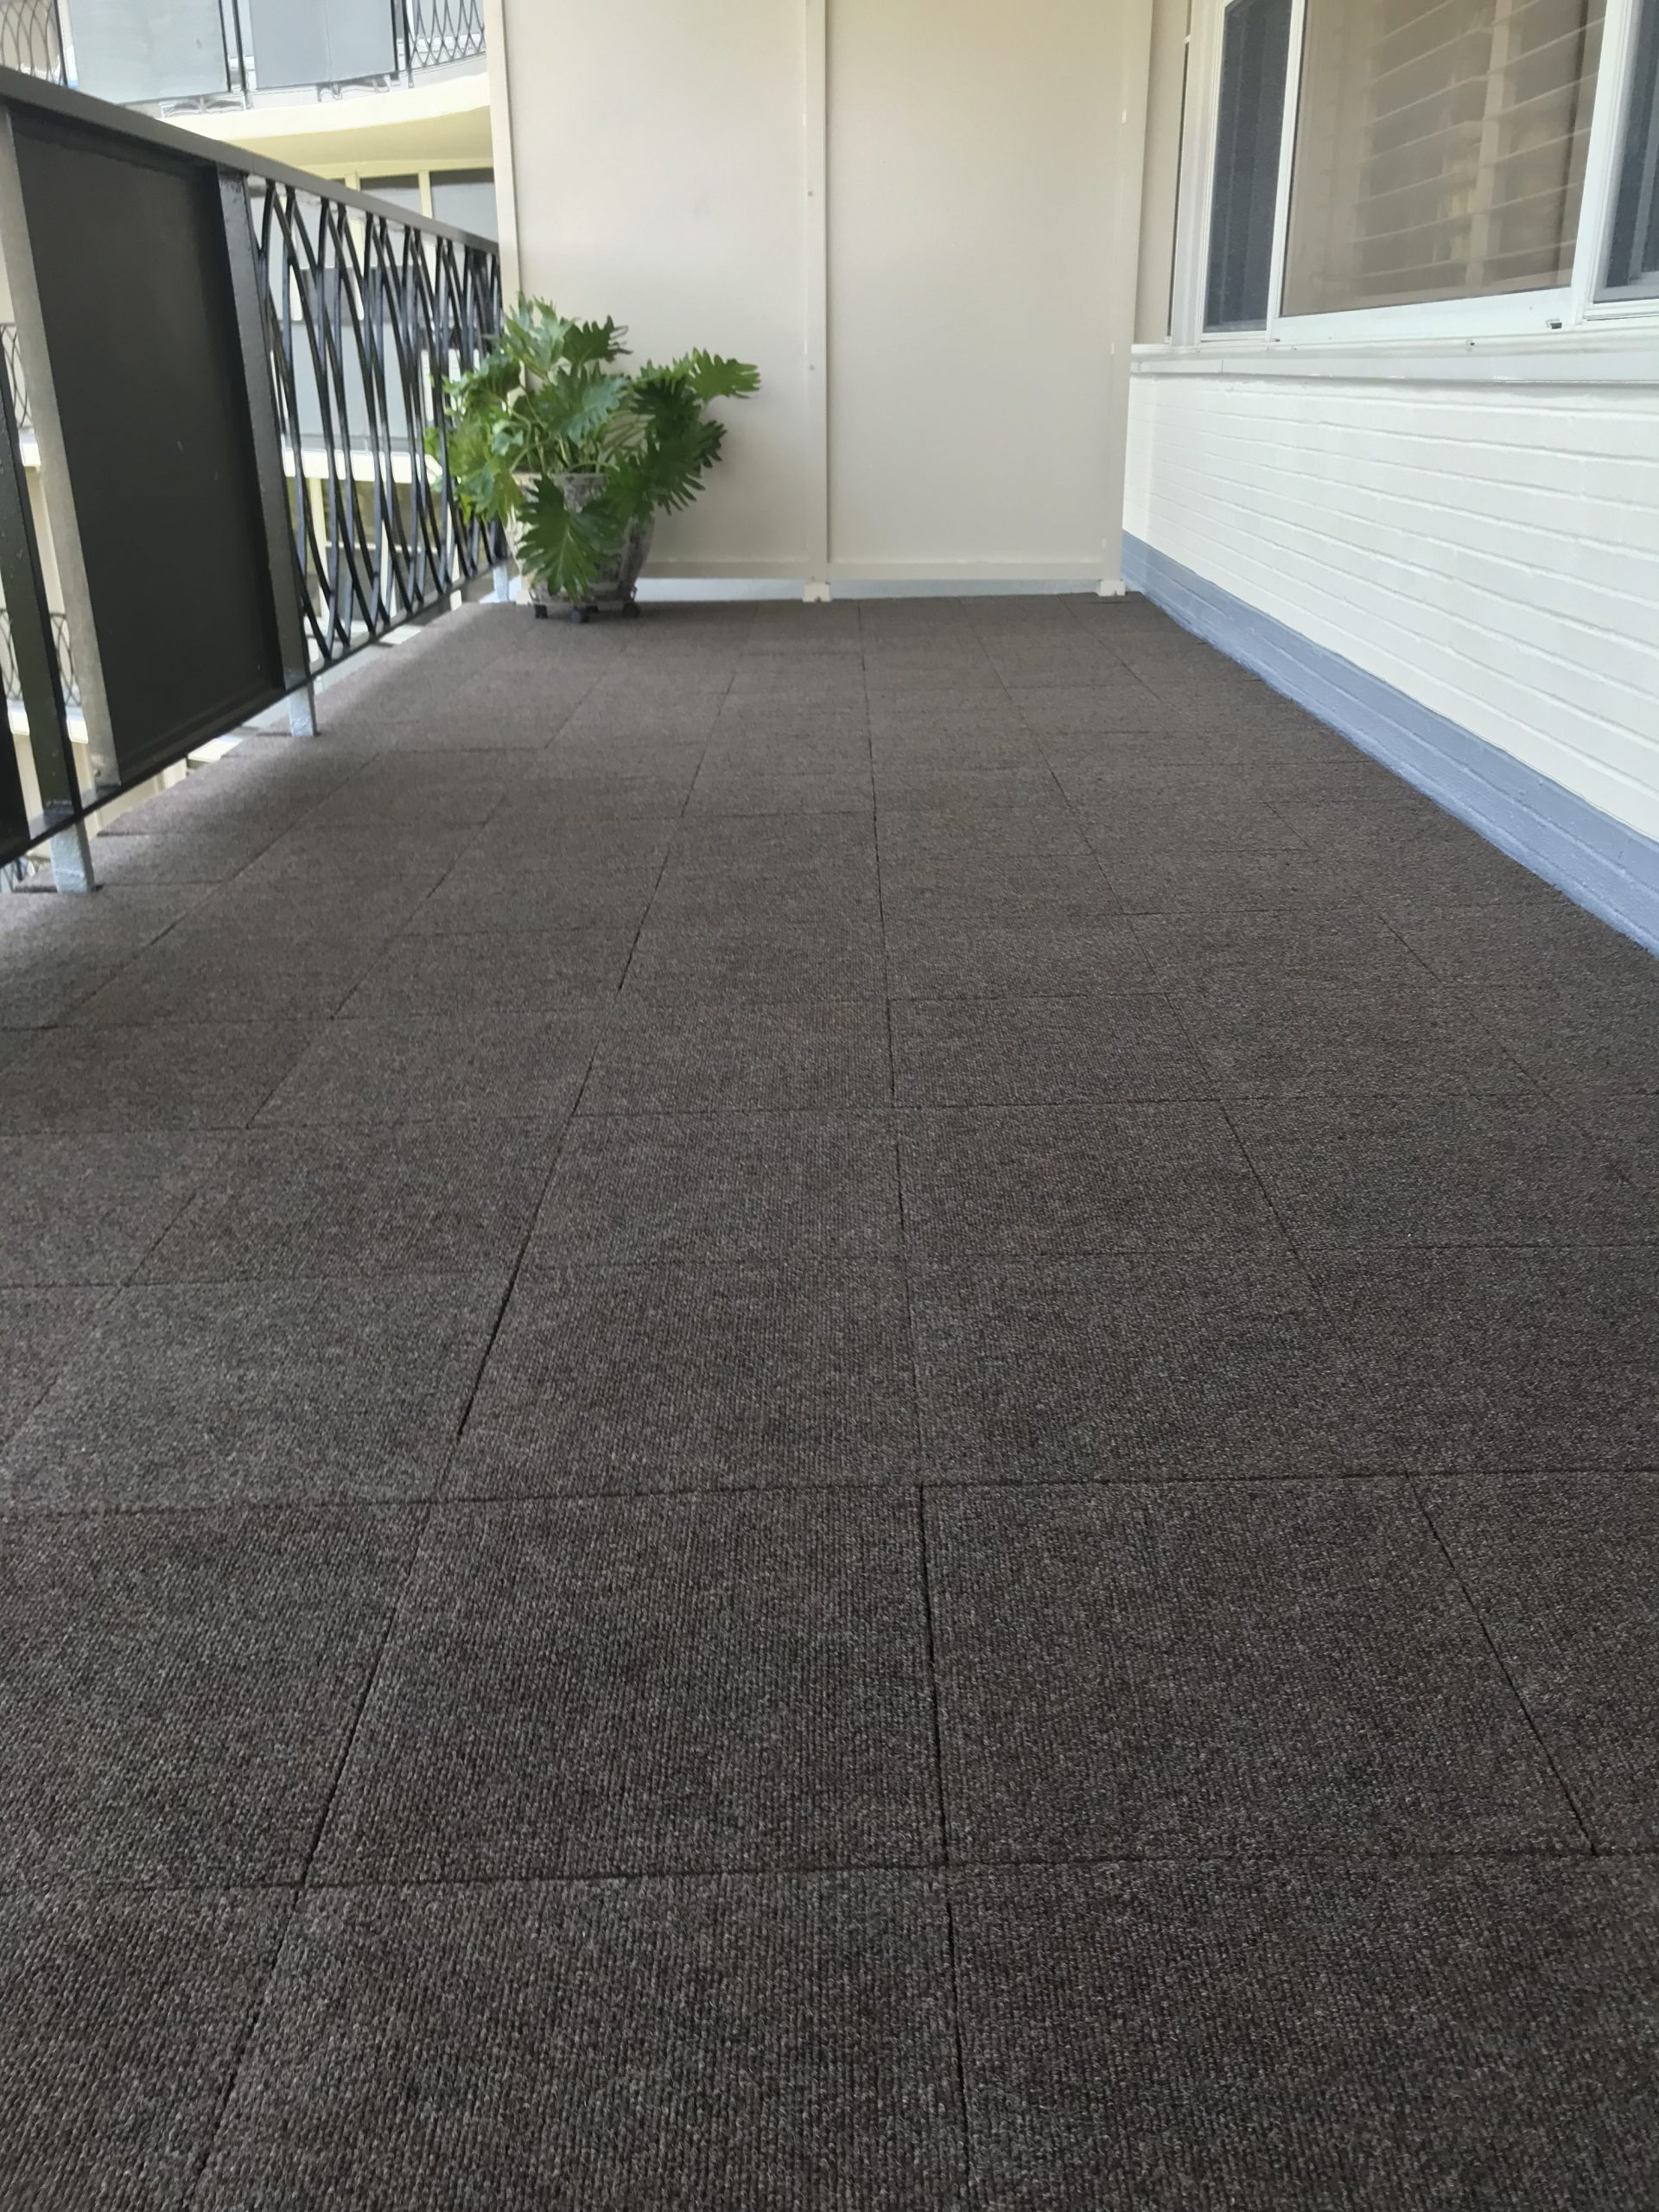 Autumn Woods Carpet Tile Install 3